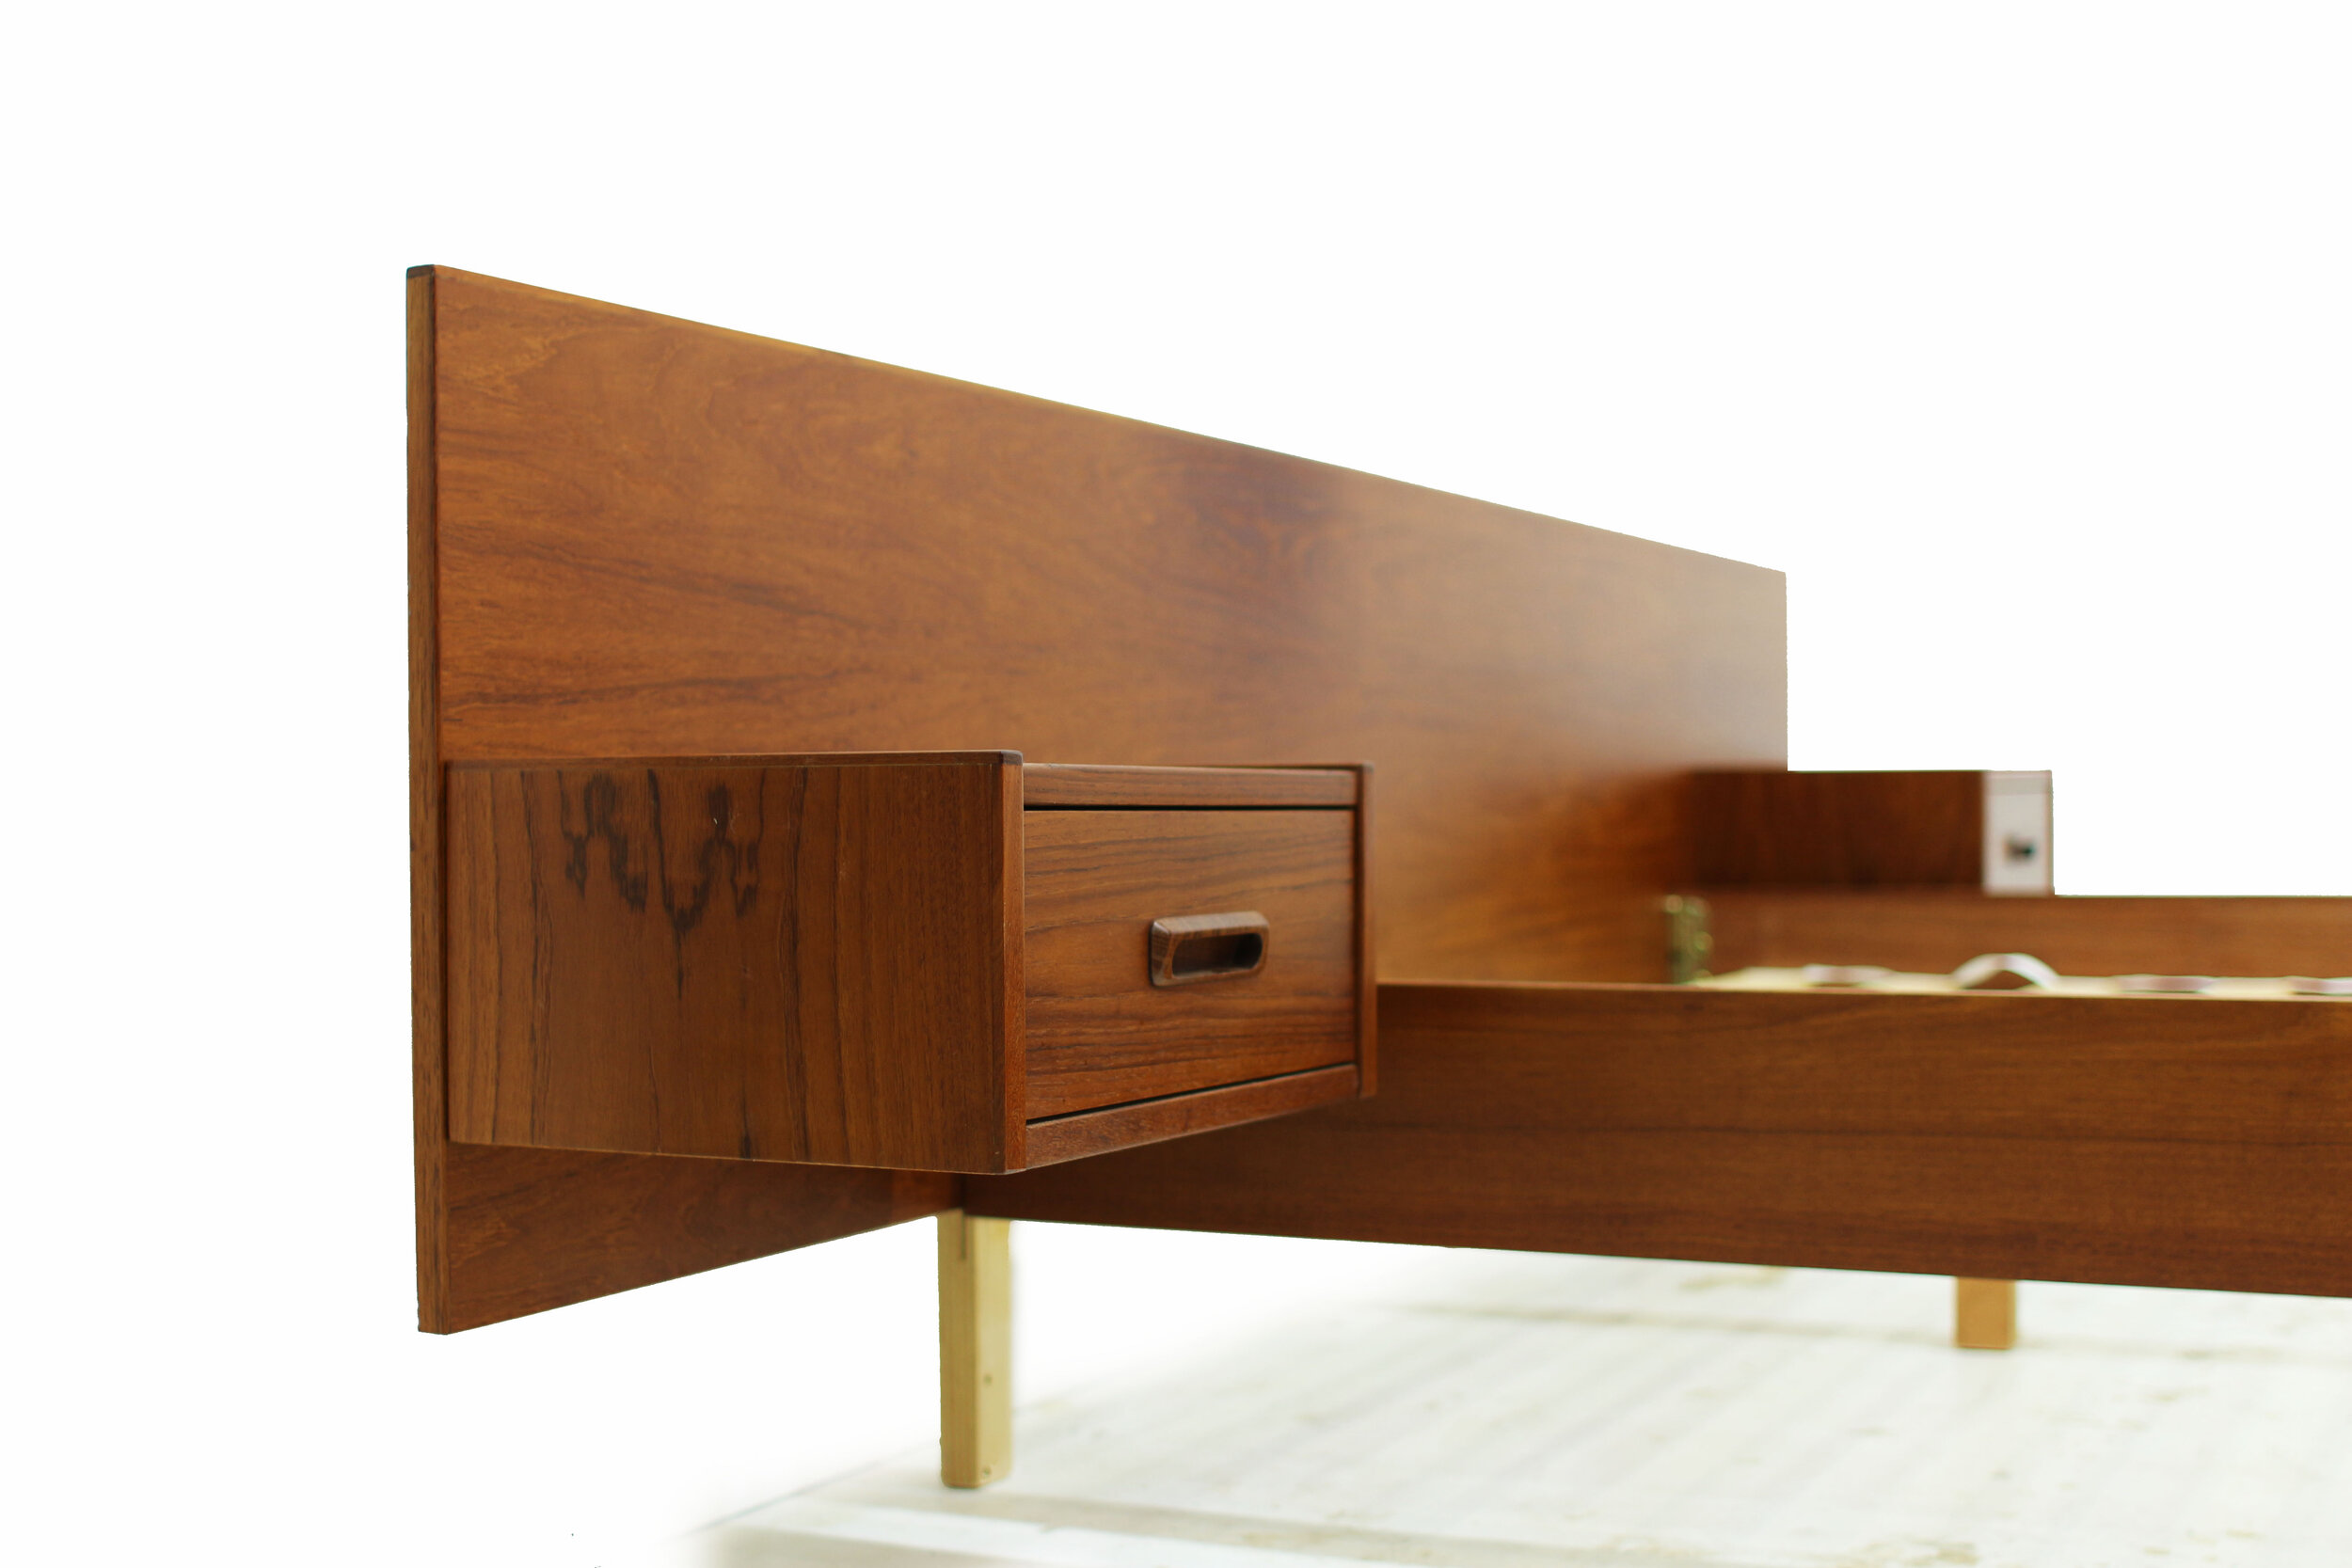 Mid Century Teak Double Platform Bed with Attached Nightstands (4).jpg